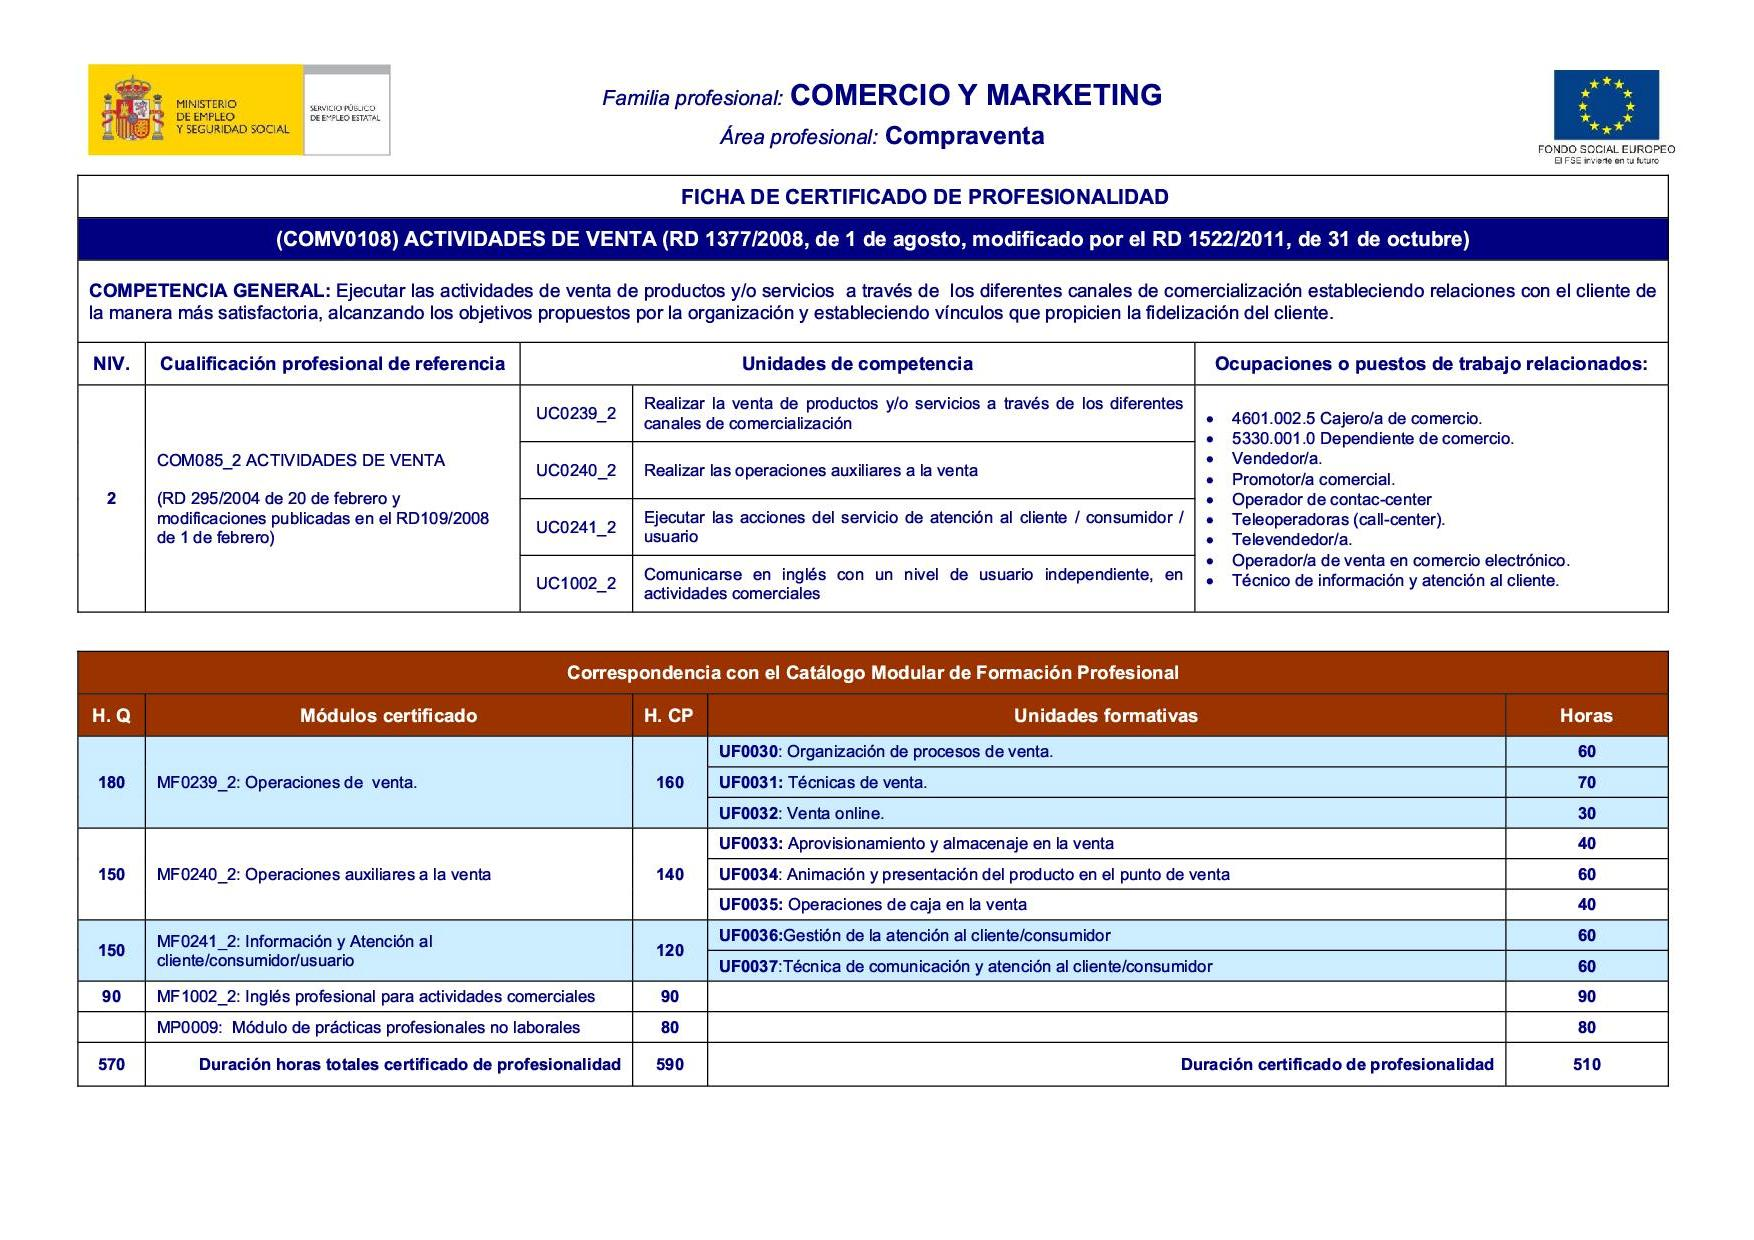 COMV0108